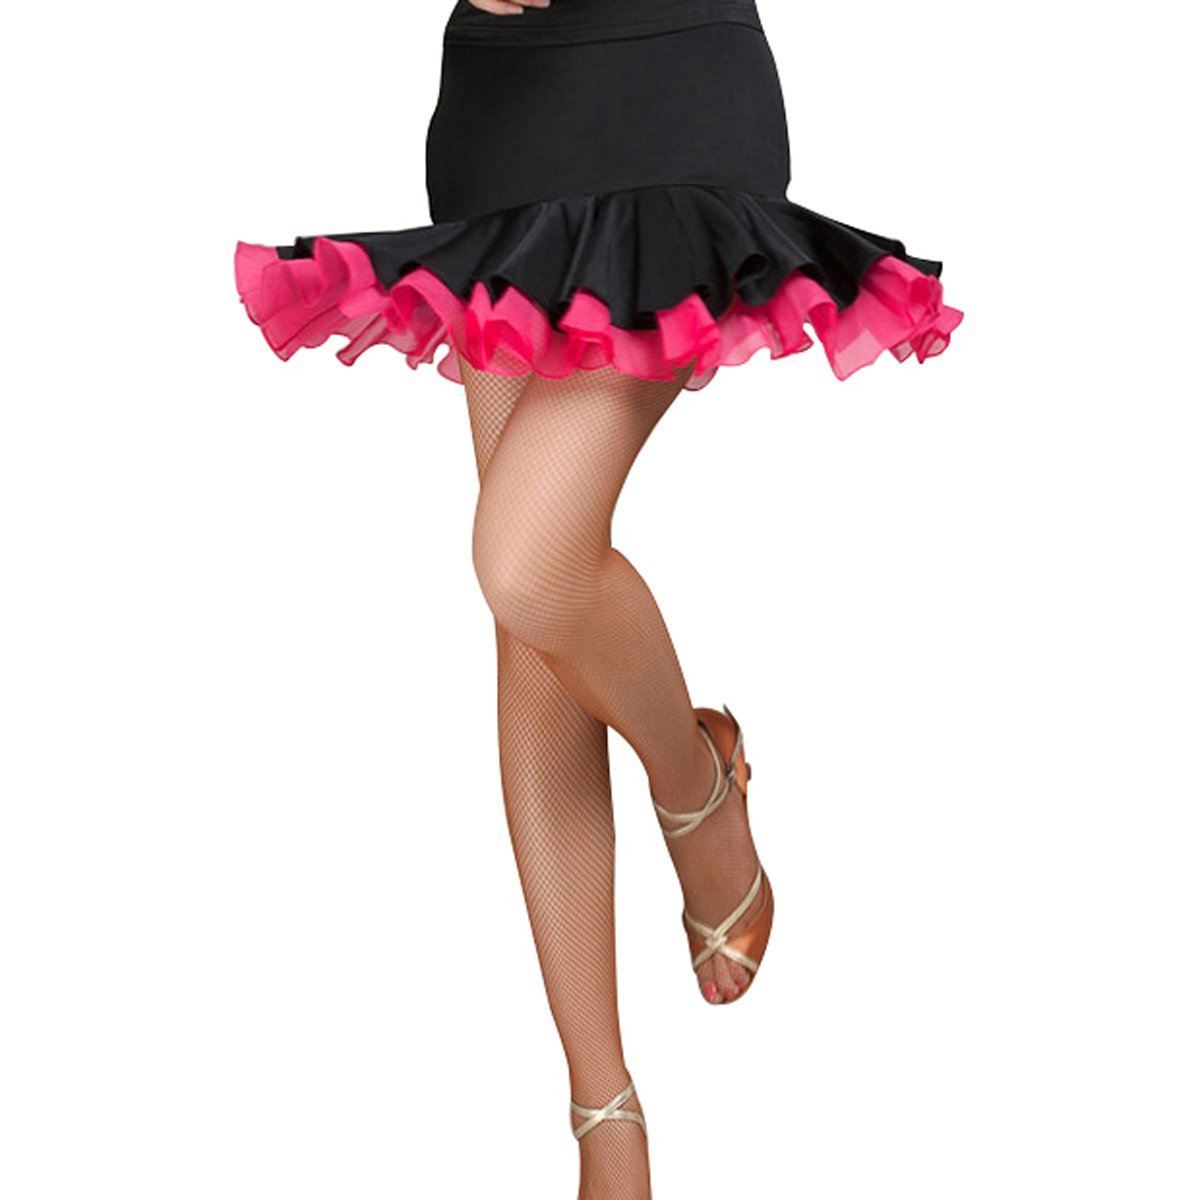 Pitping Latin Ballroom Dance Fishnet Tights Stockings for Dancer Seamless Tights Ballet